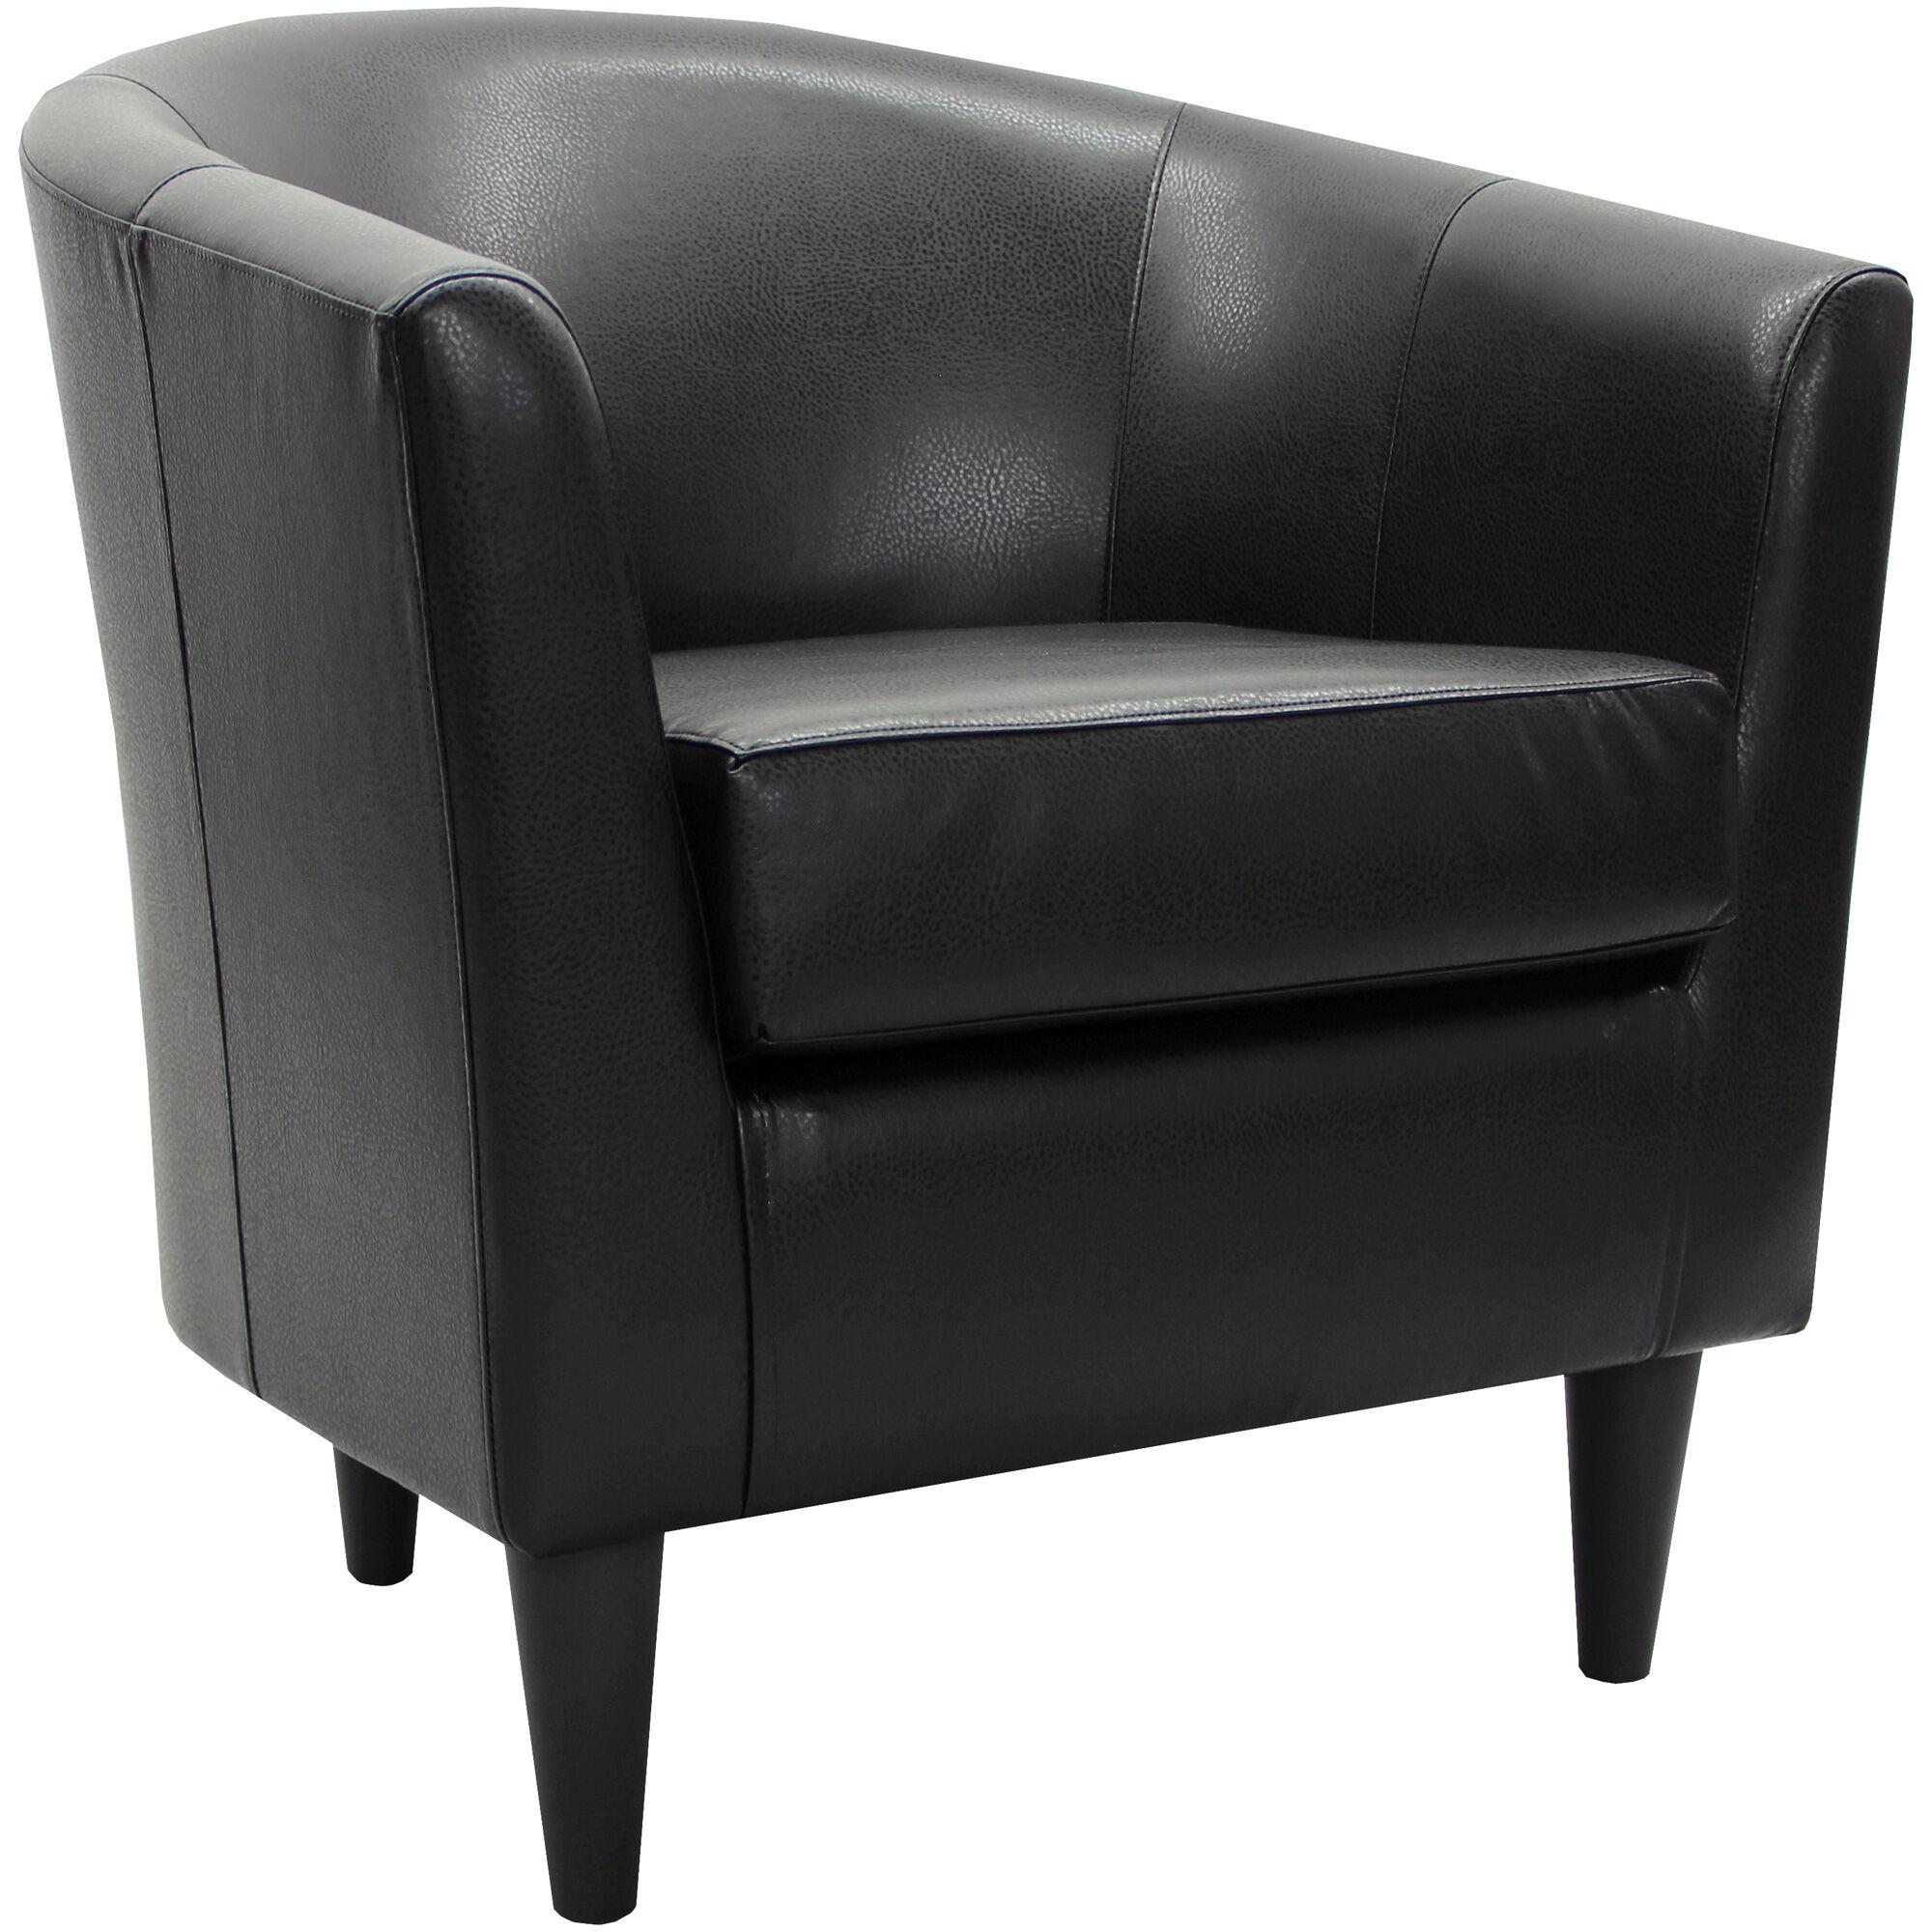 Slumberland Furniture Windsor Black Accent Chair